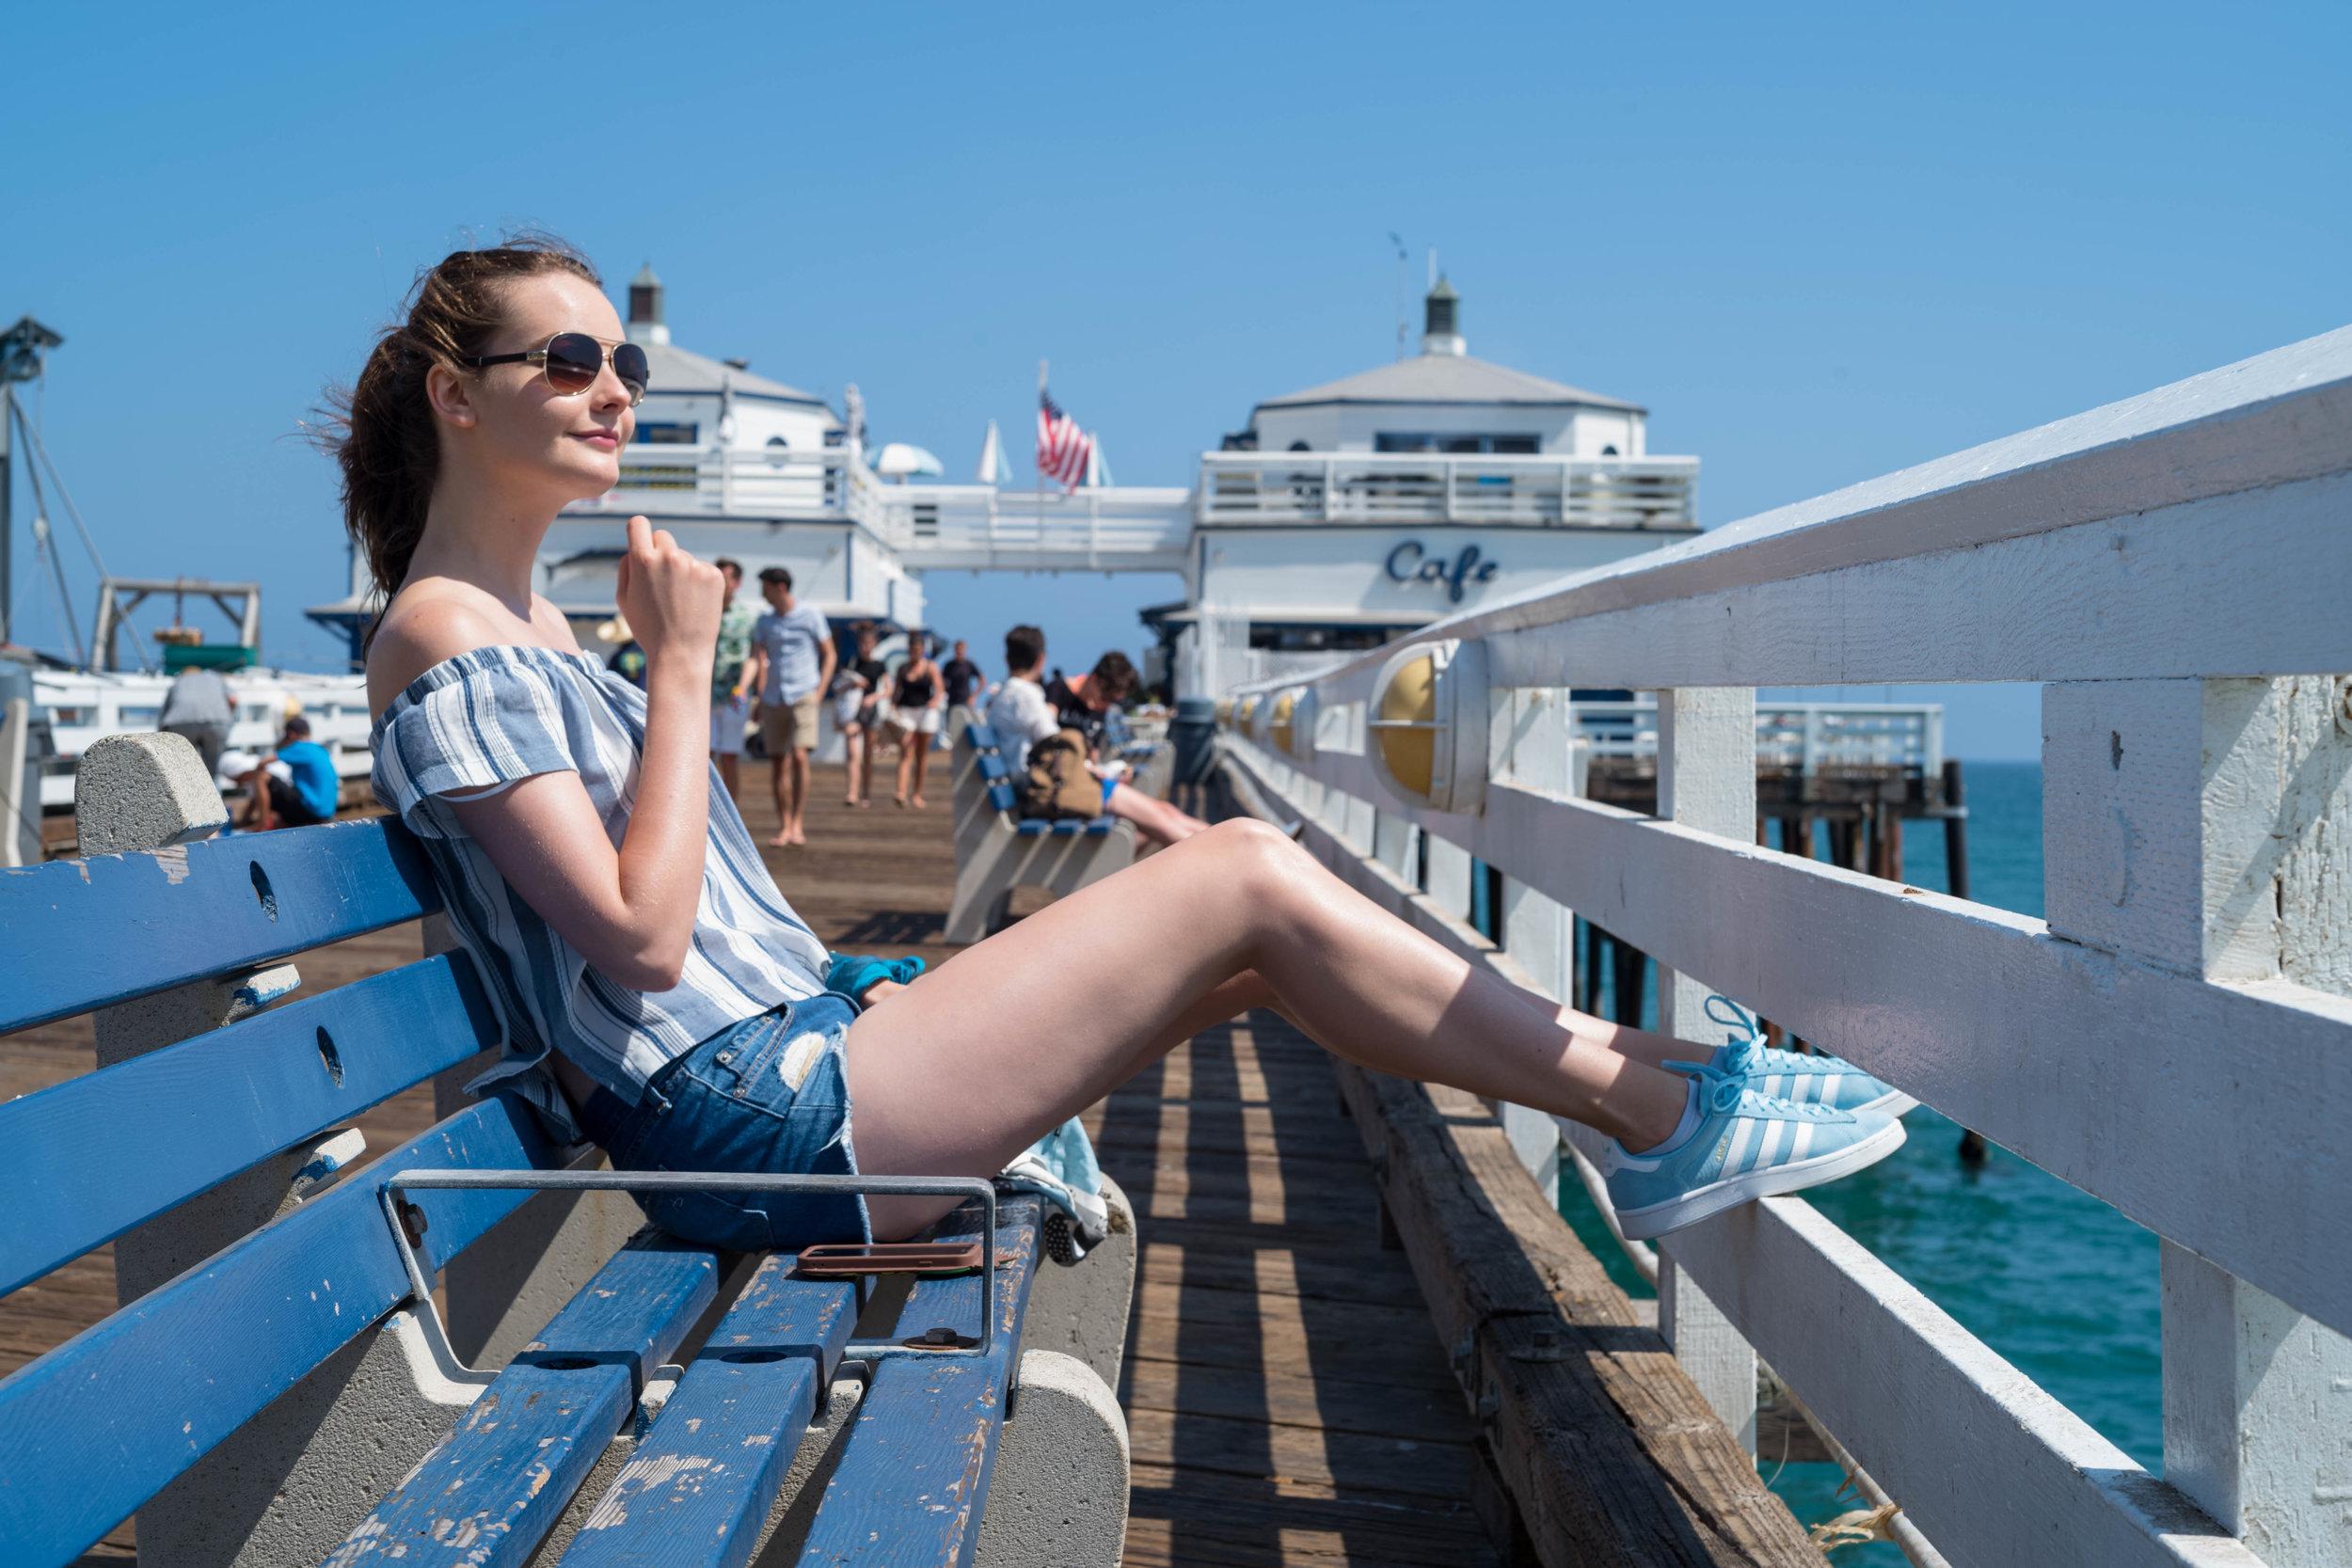 On a park bench, at Malibu Pier. Leica APO 50mm f/2 Summicron ASPH